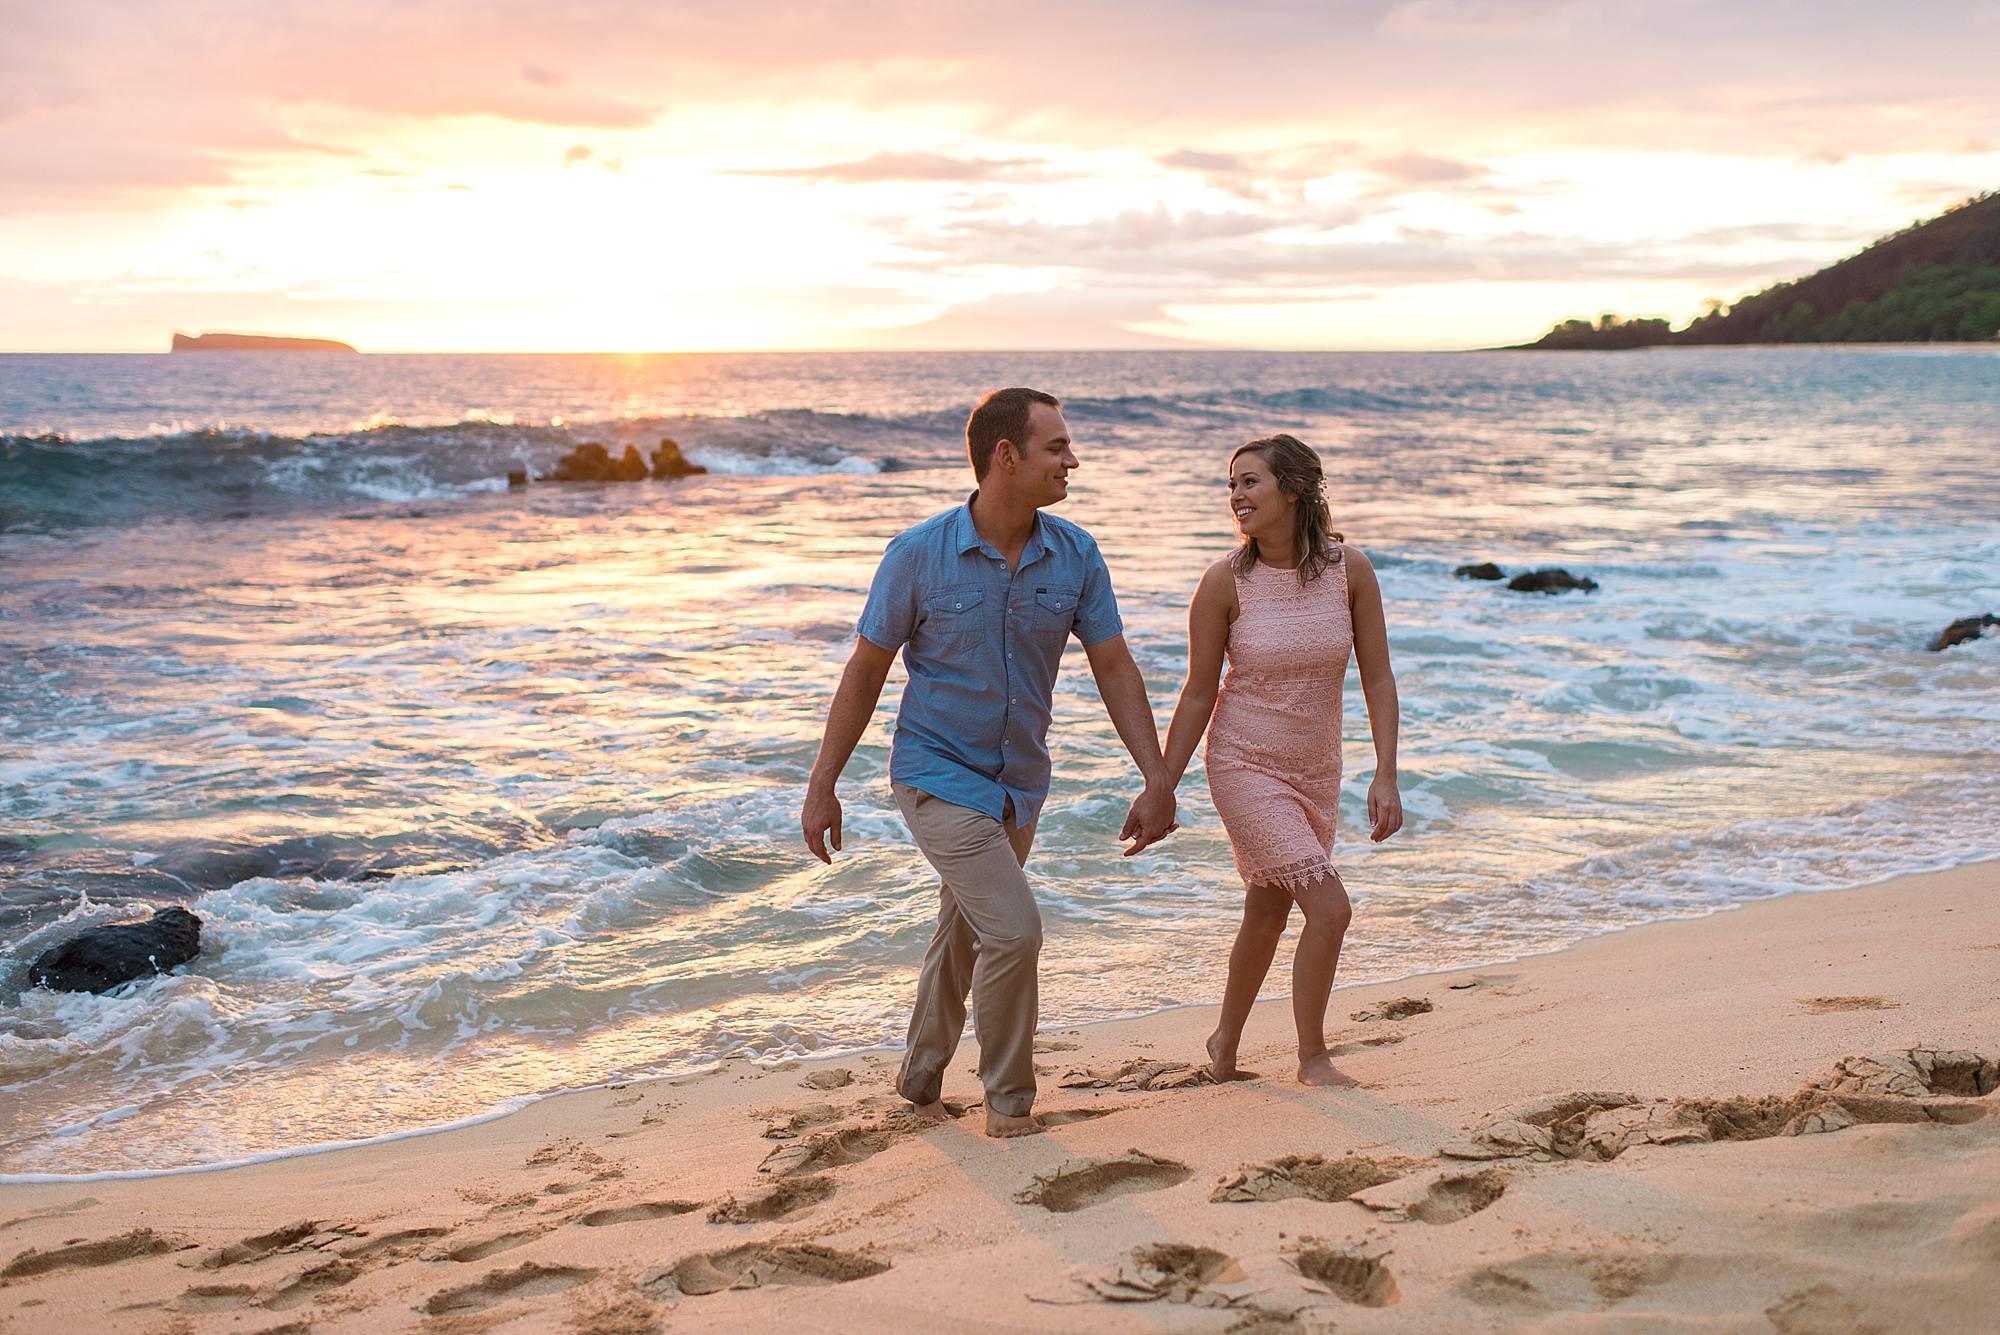 couple in love on the beach in maui, hawaii